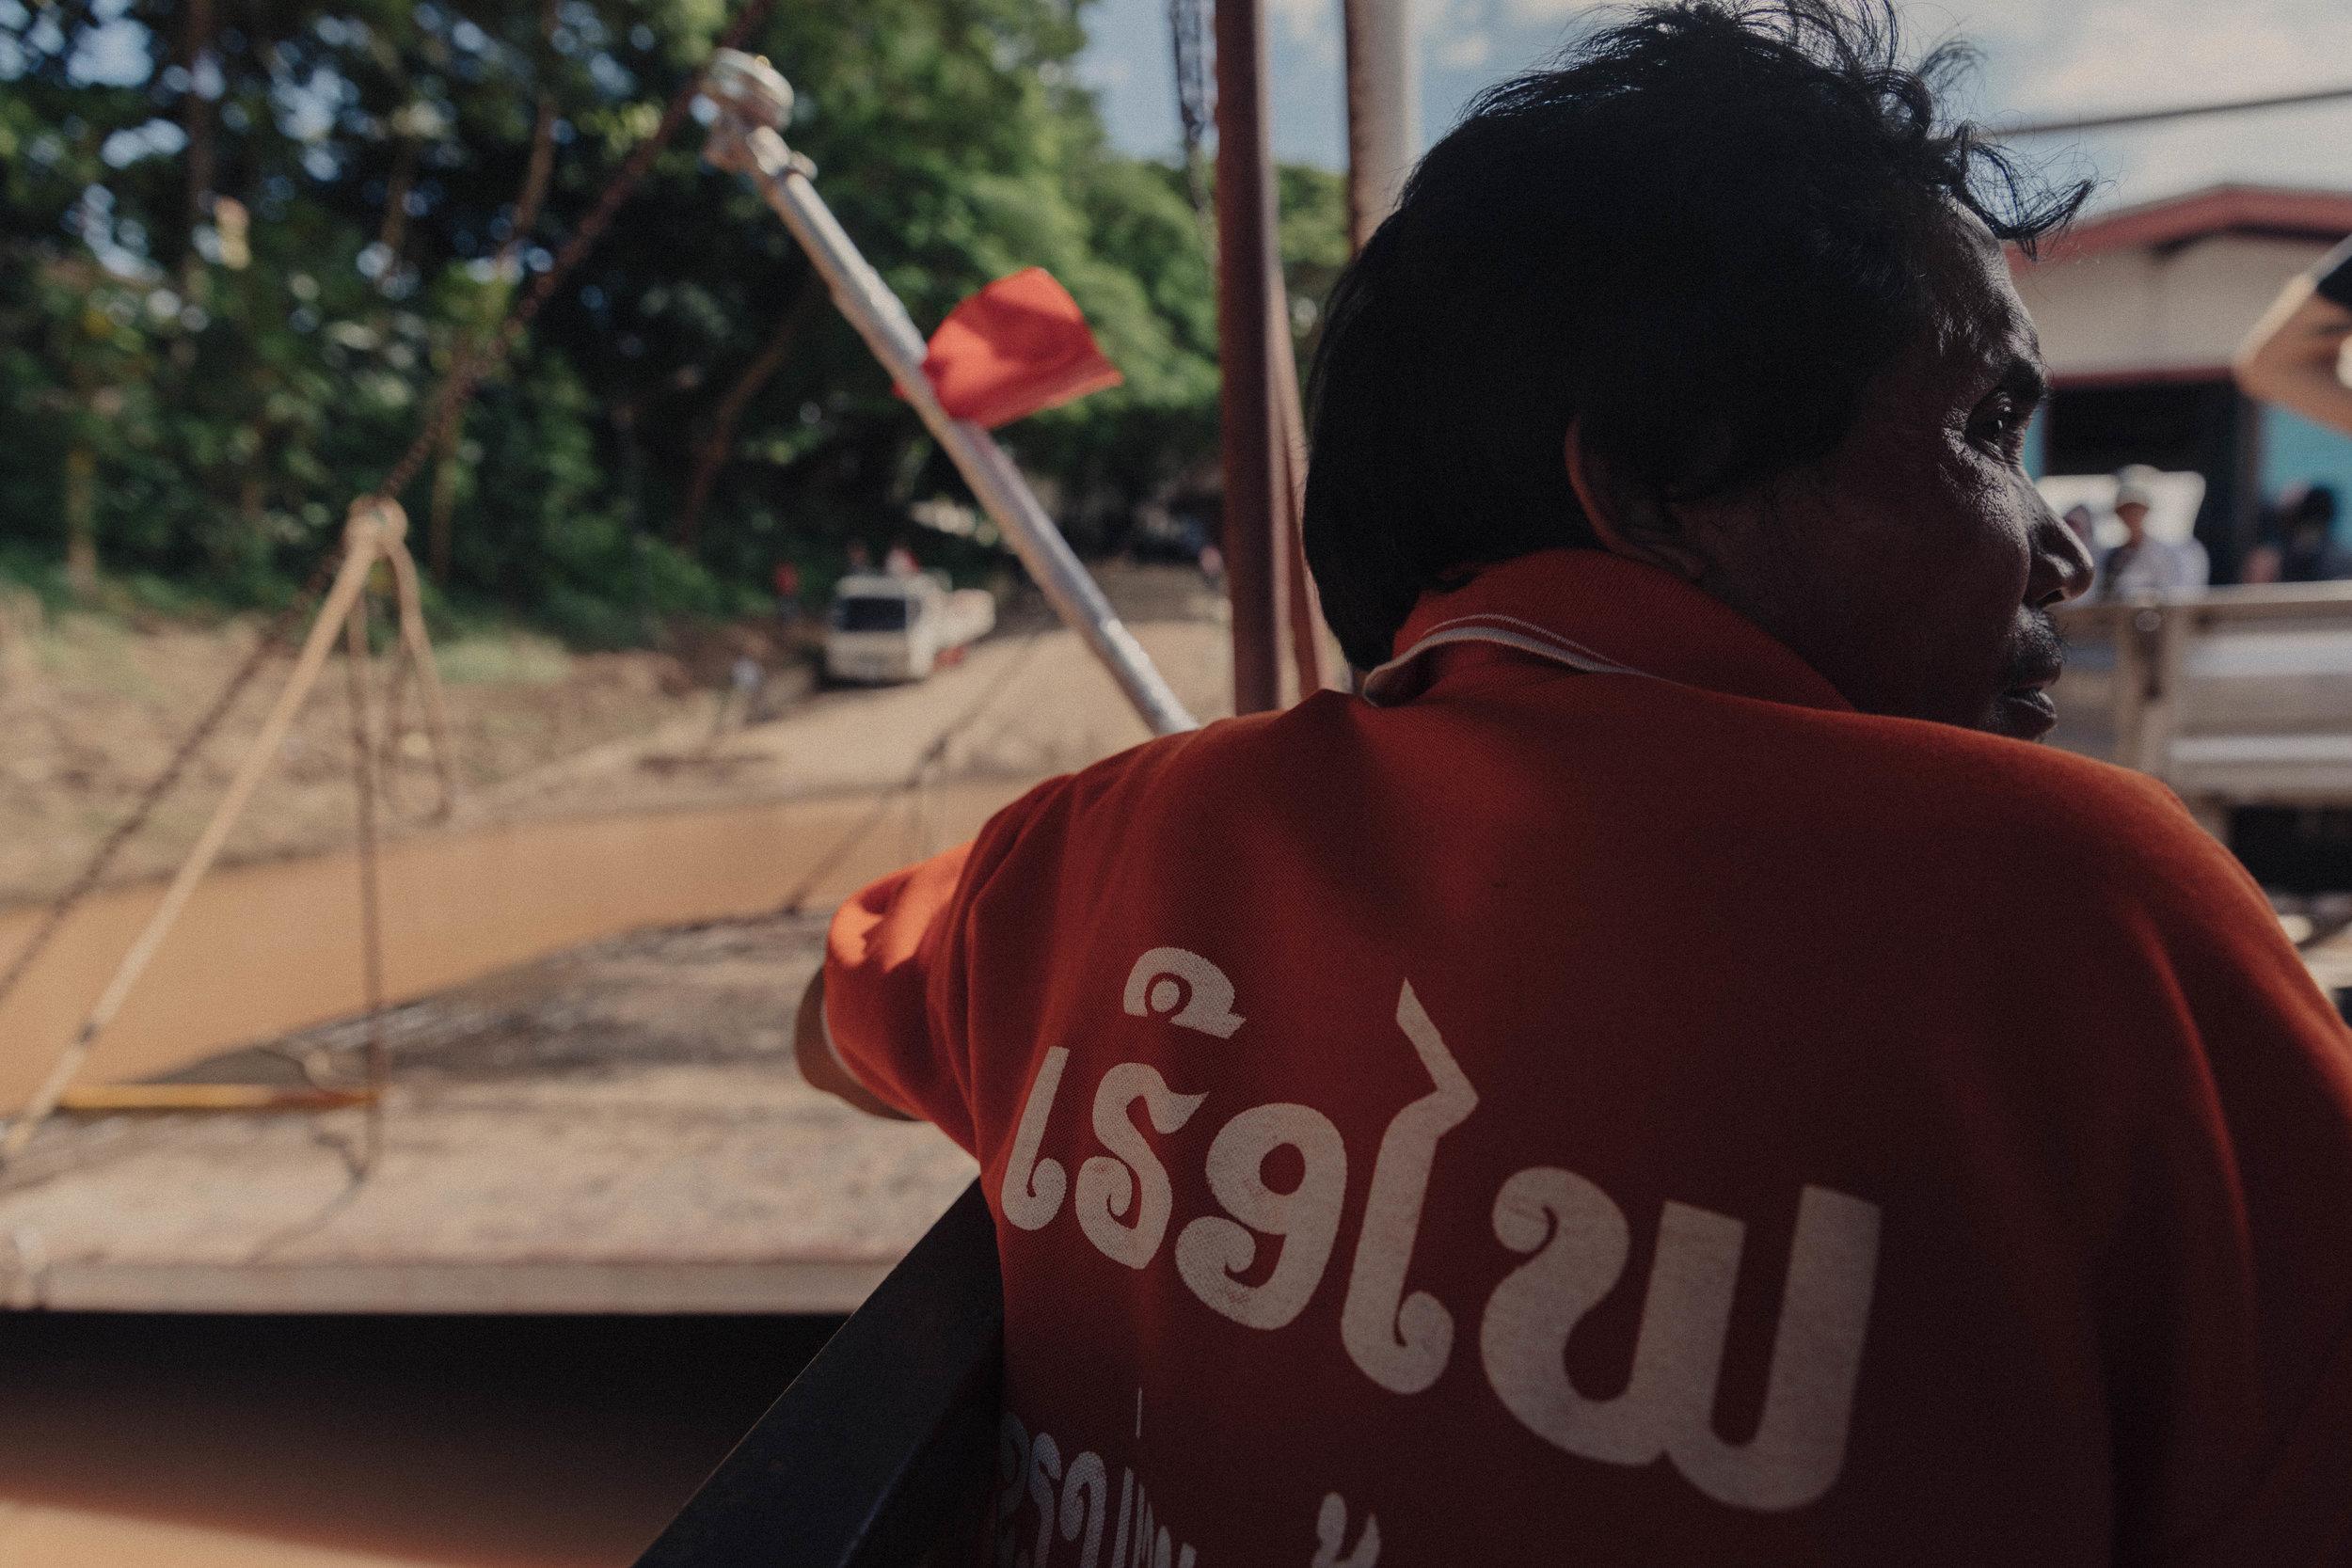 Laos_AB-2380.jpg